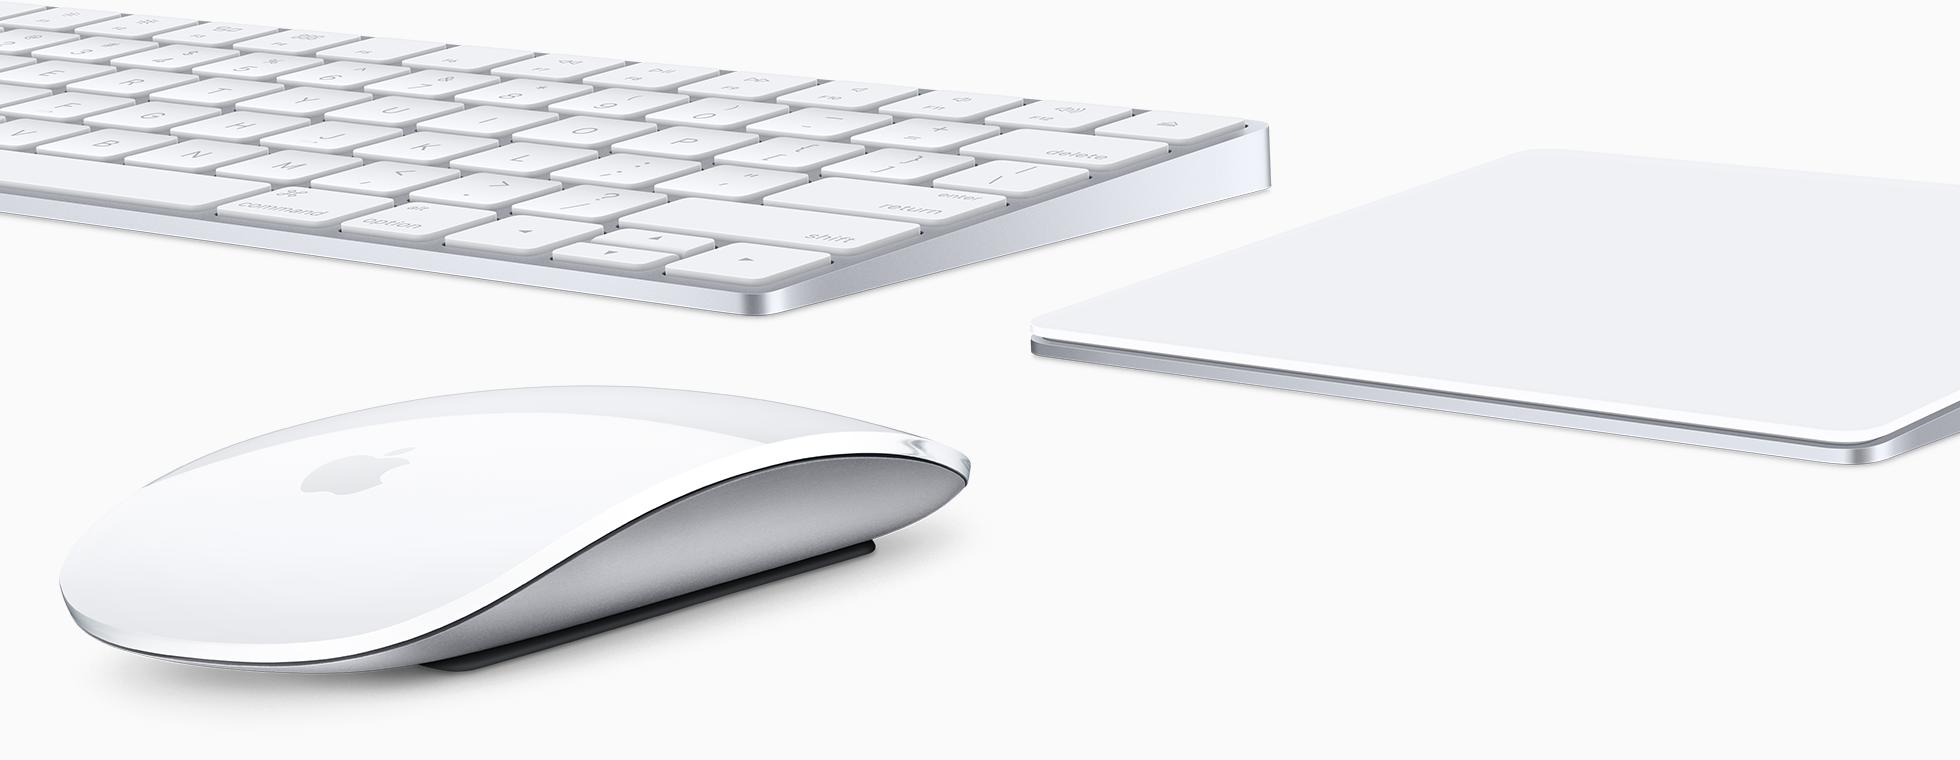 data-news-mac_accessories_pdp_201510